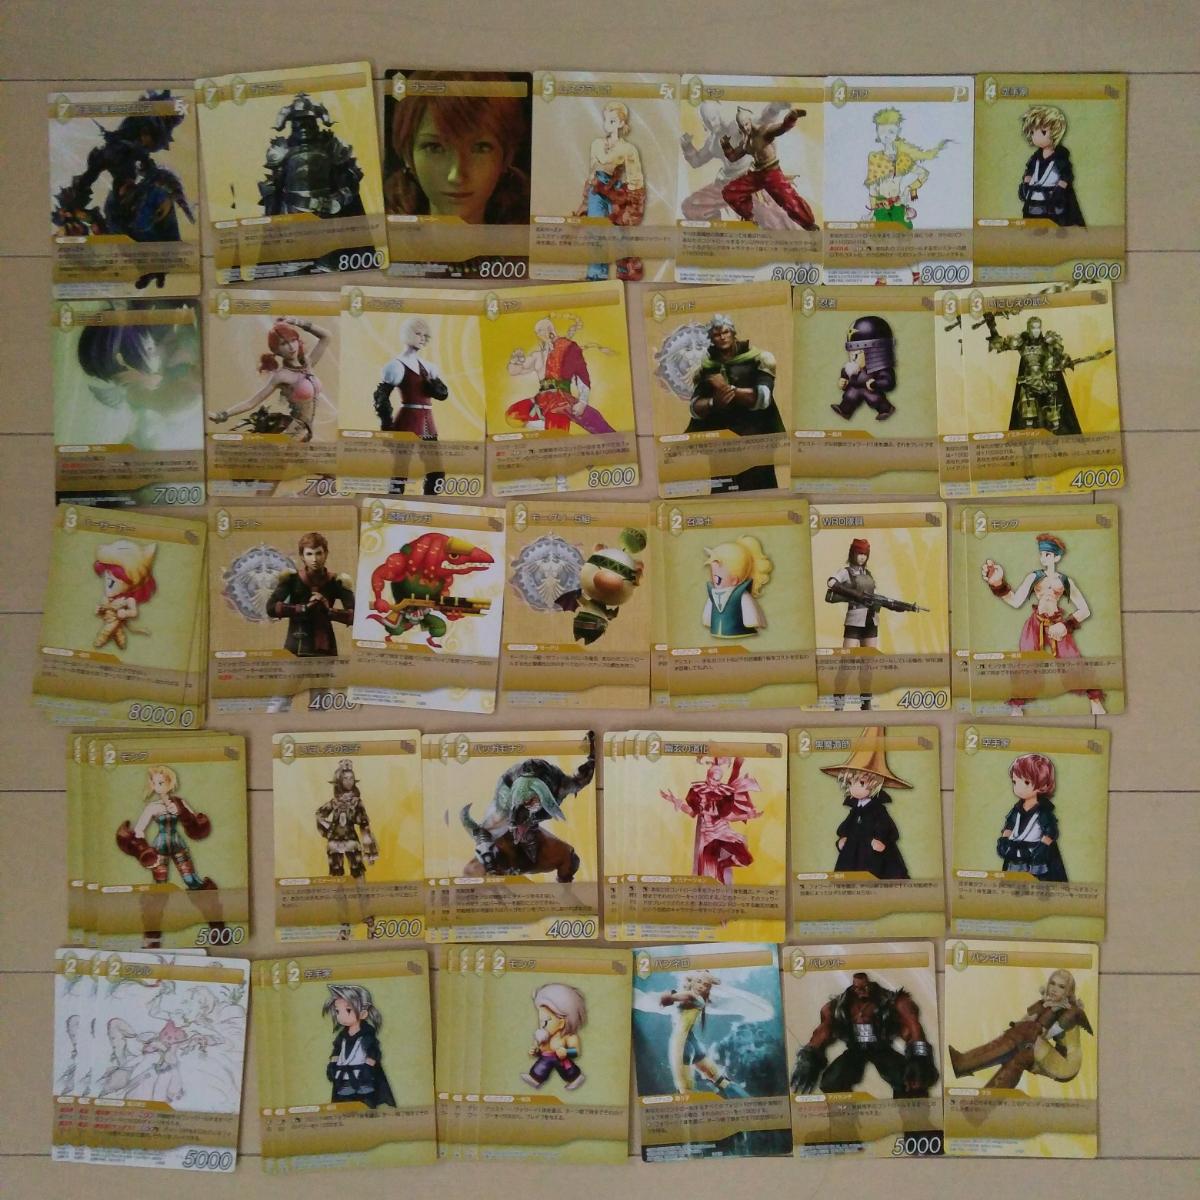 【FF TCG】ファイナルファンタジー トレーディングカードゲーム 337枚(ホロ9枚)スリーブケース 大量 まとめ売り マキナ ライトニング_画像8